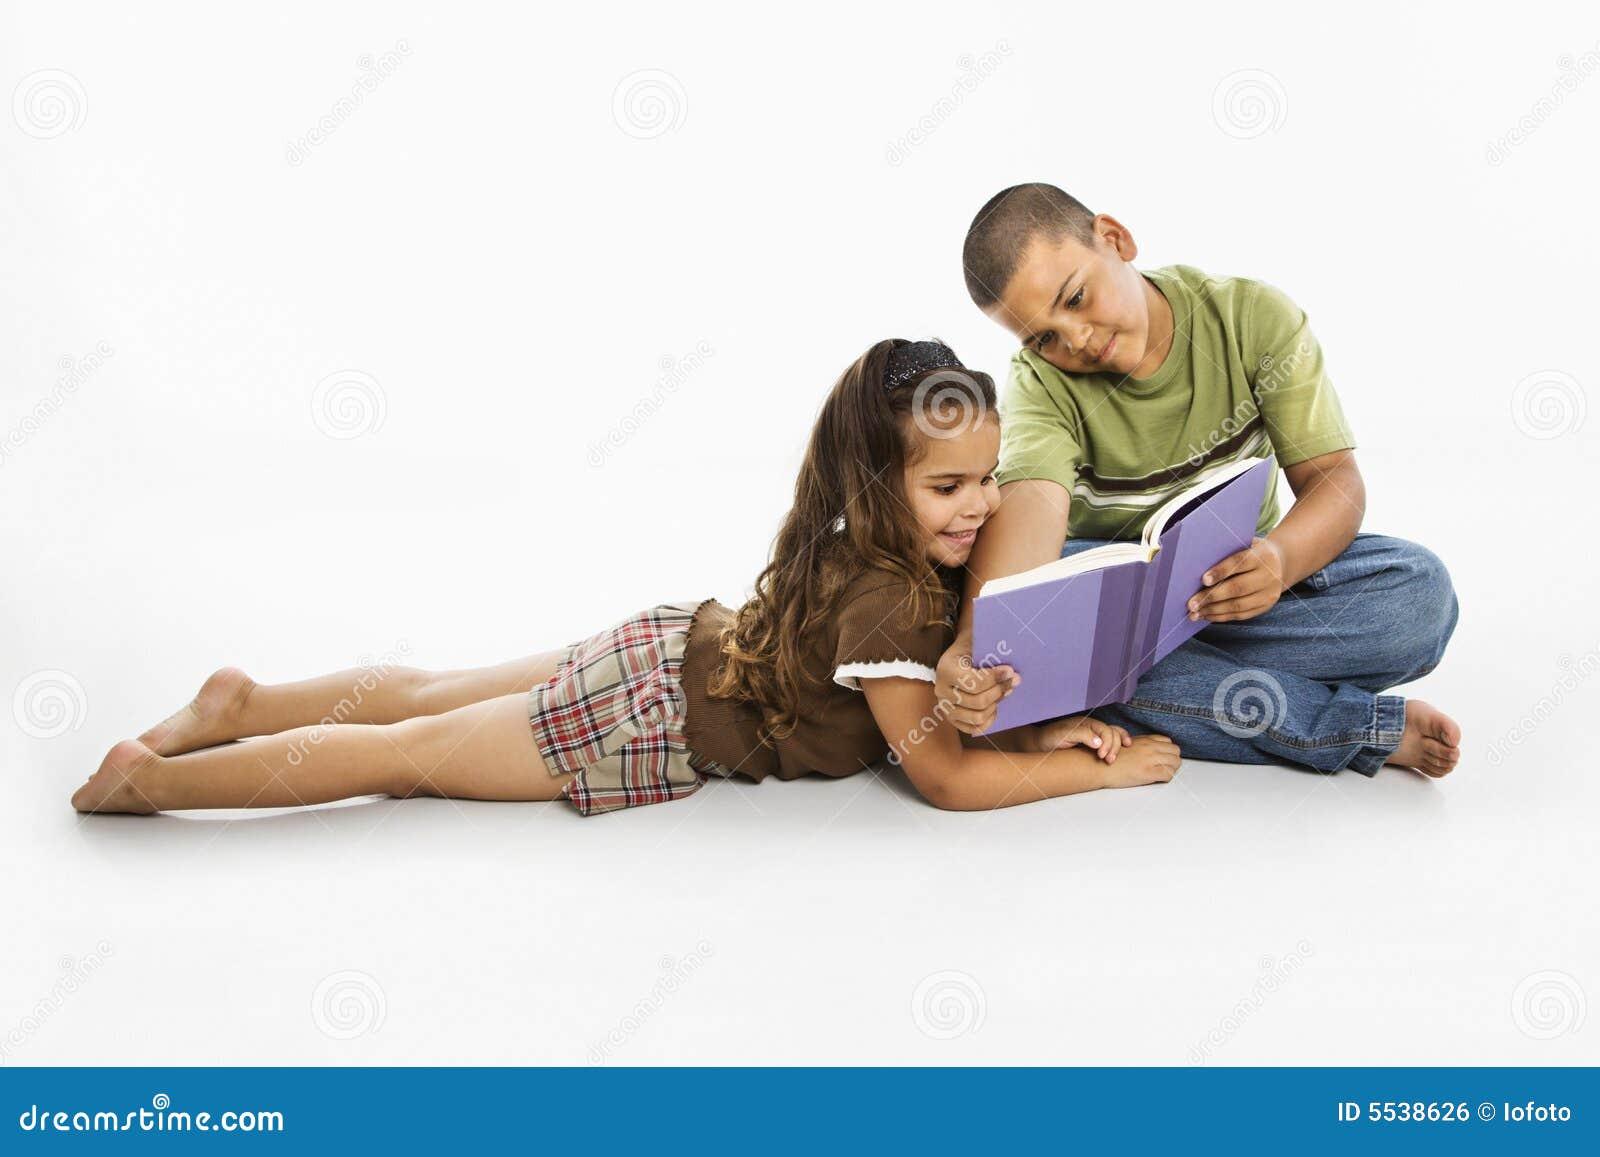 Spaans jongen en meisjeslezingsboek samen.